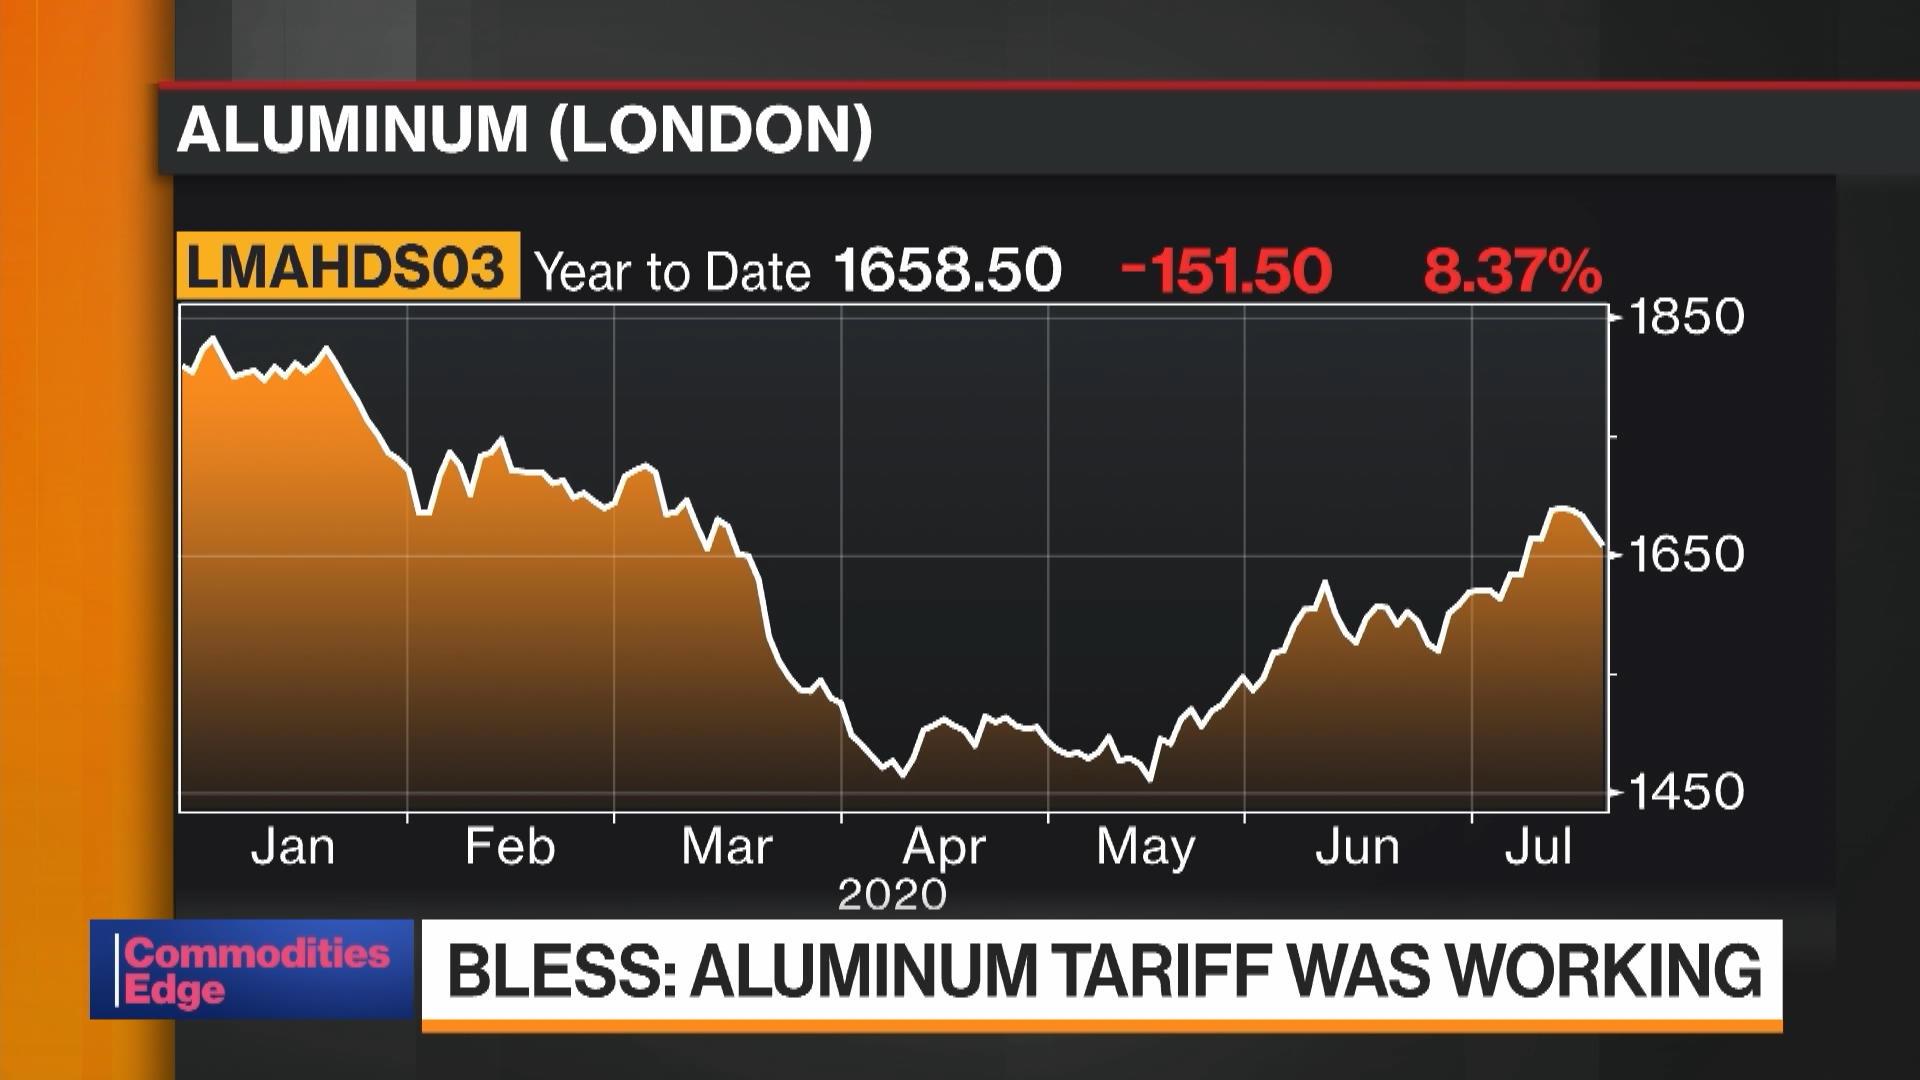 Century CEO Says White House Aware of Canada Aluminum 'Surge'